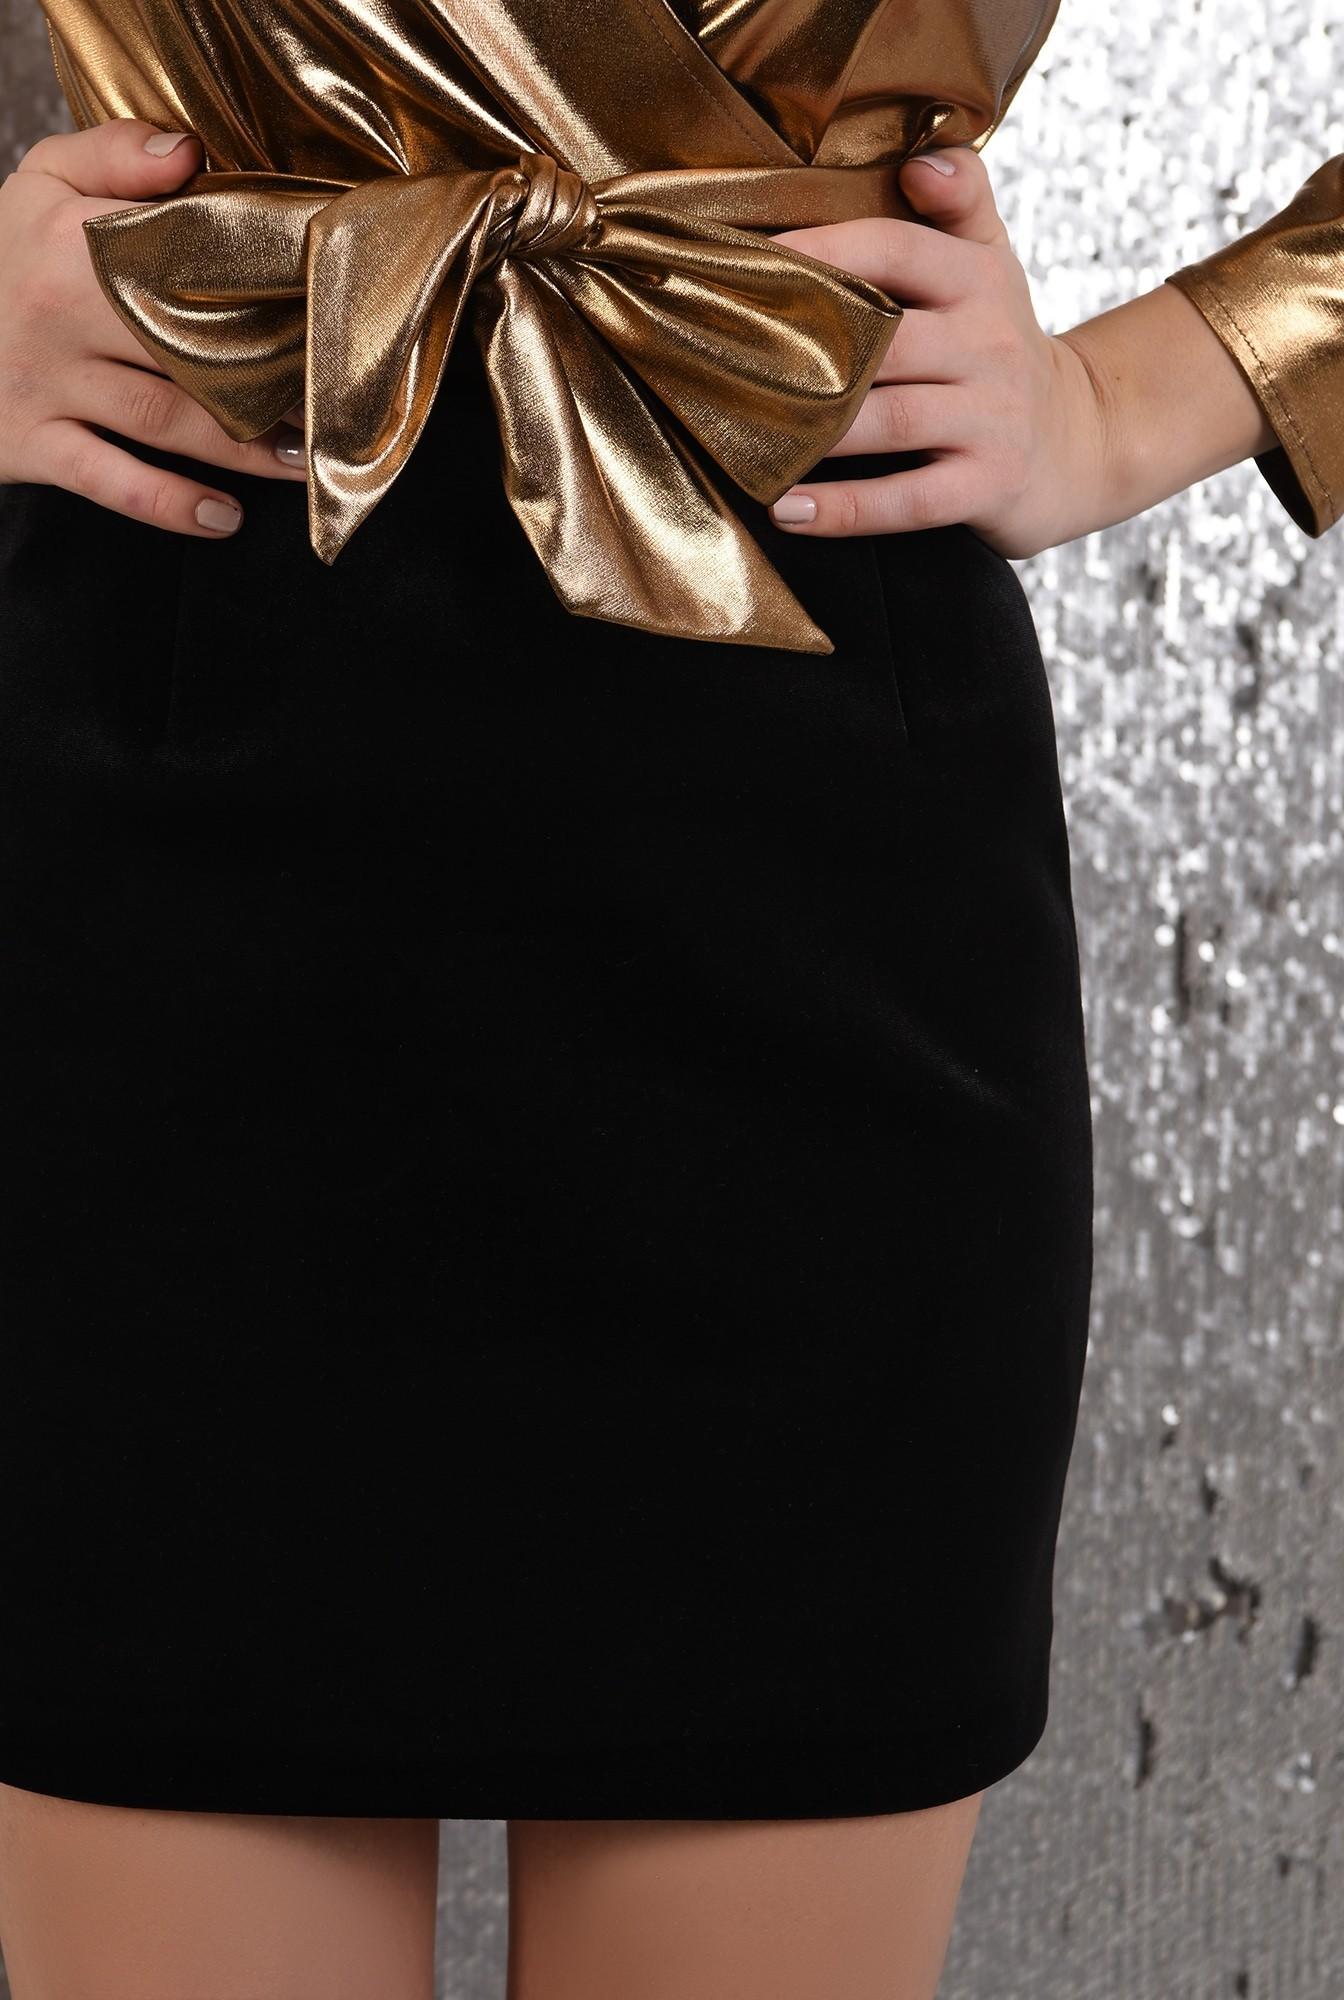 2 -  fusta eleganta, Poema, din catifea, talie inalta, mini